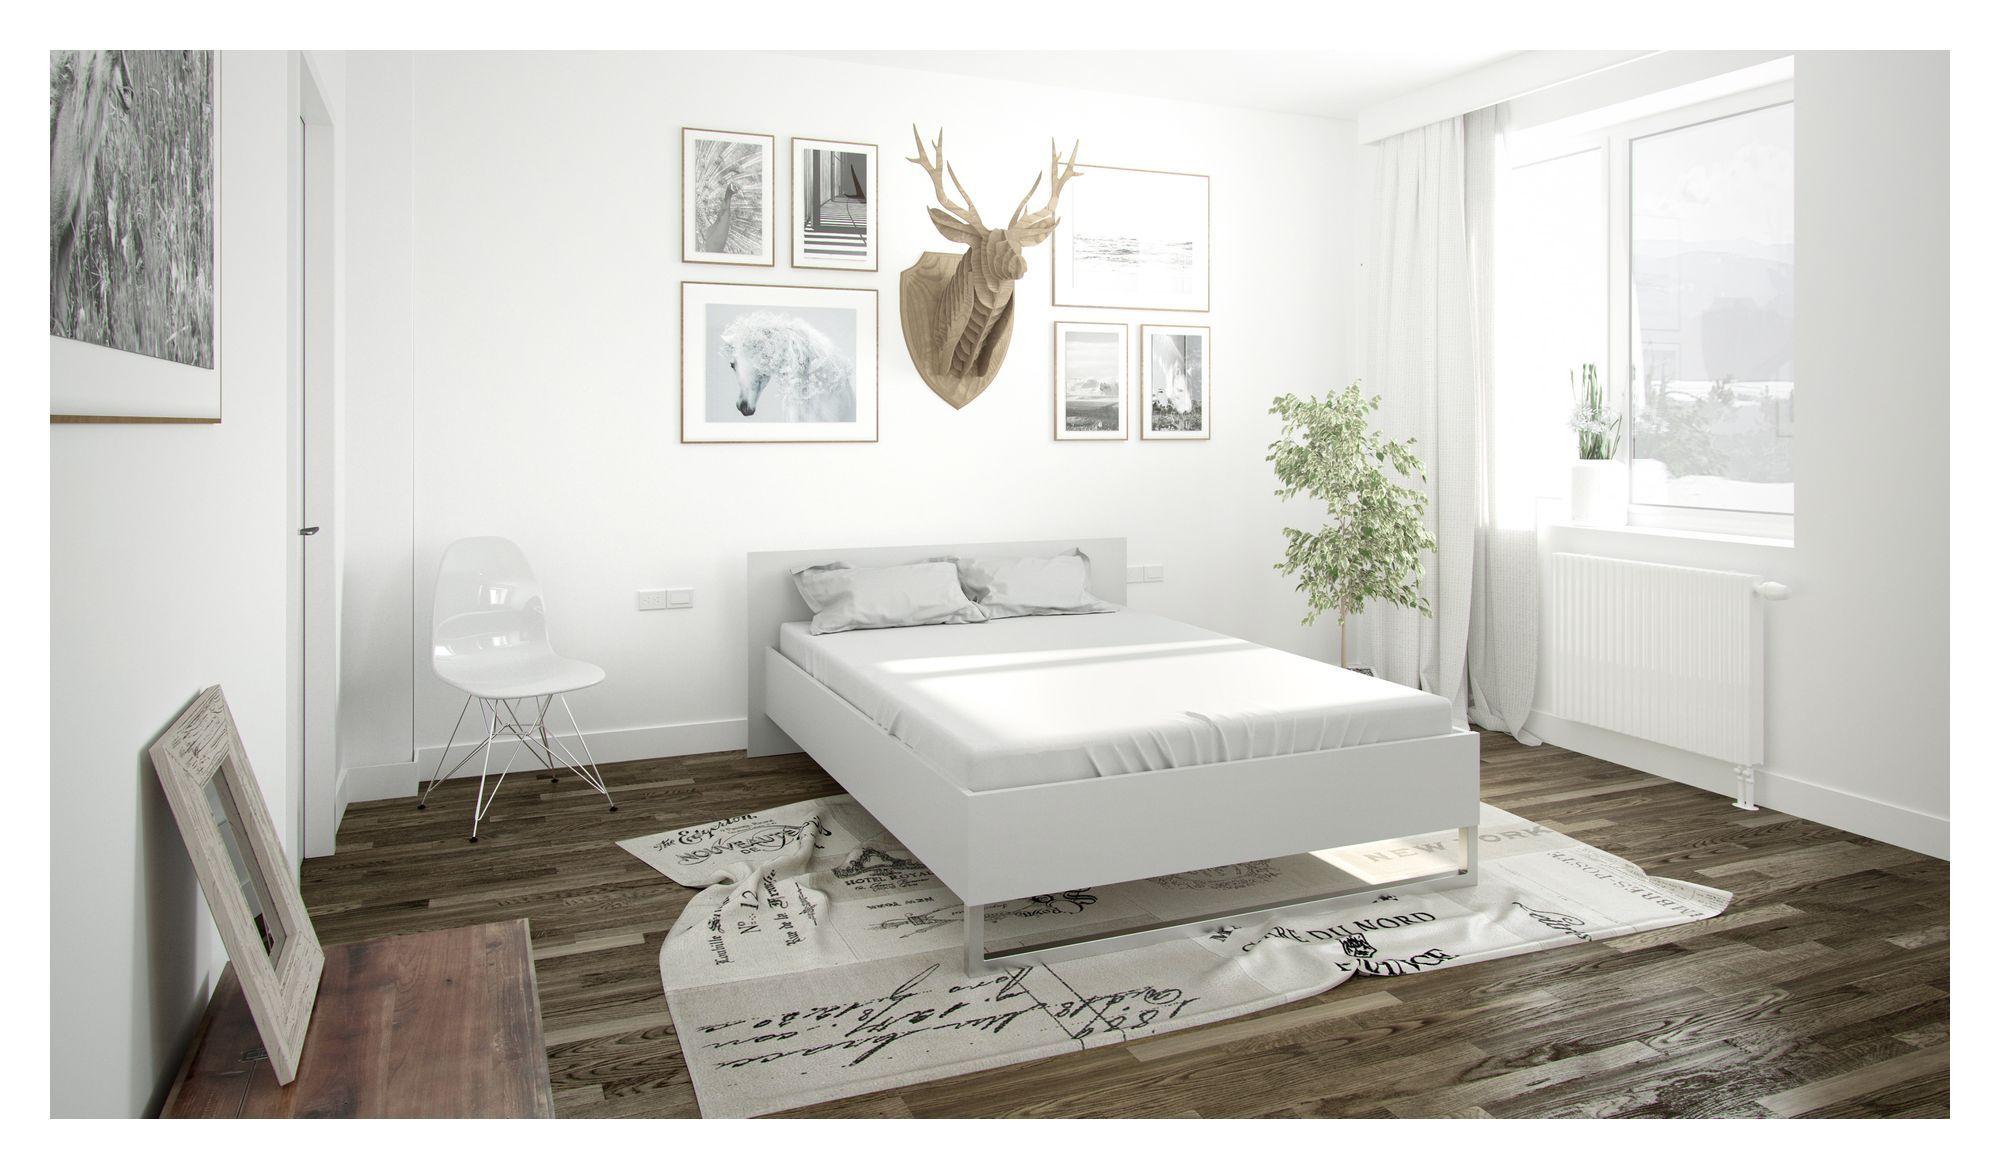 Style Sengeramme - Hvid 140x200 - Hvid seng - 140x200 cm